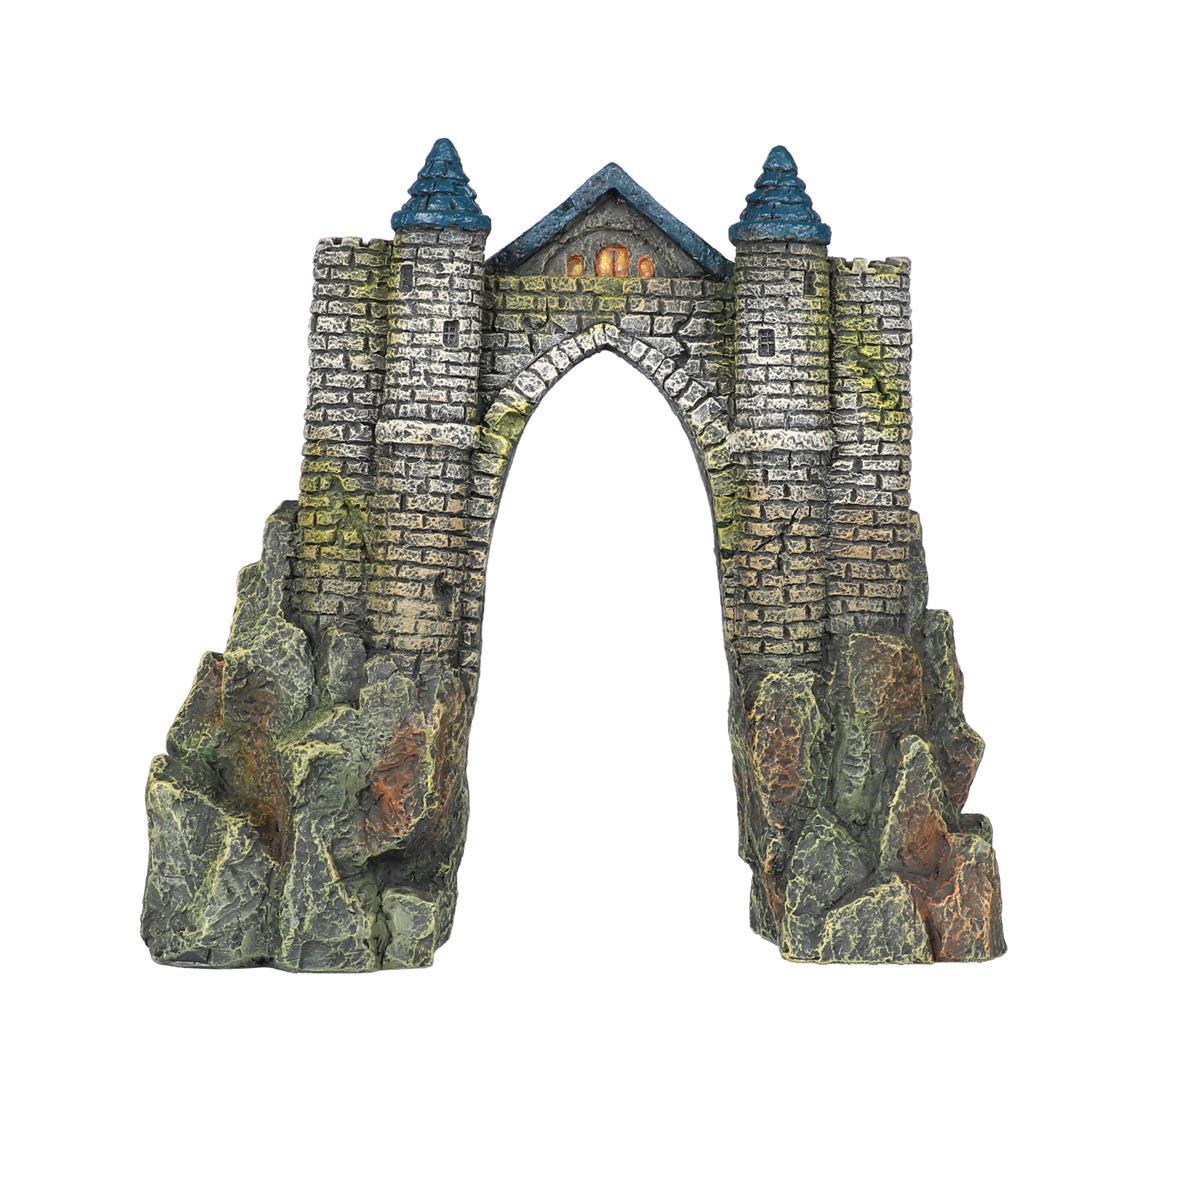 Akvariedekor Camelot Slott 20 cm